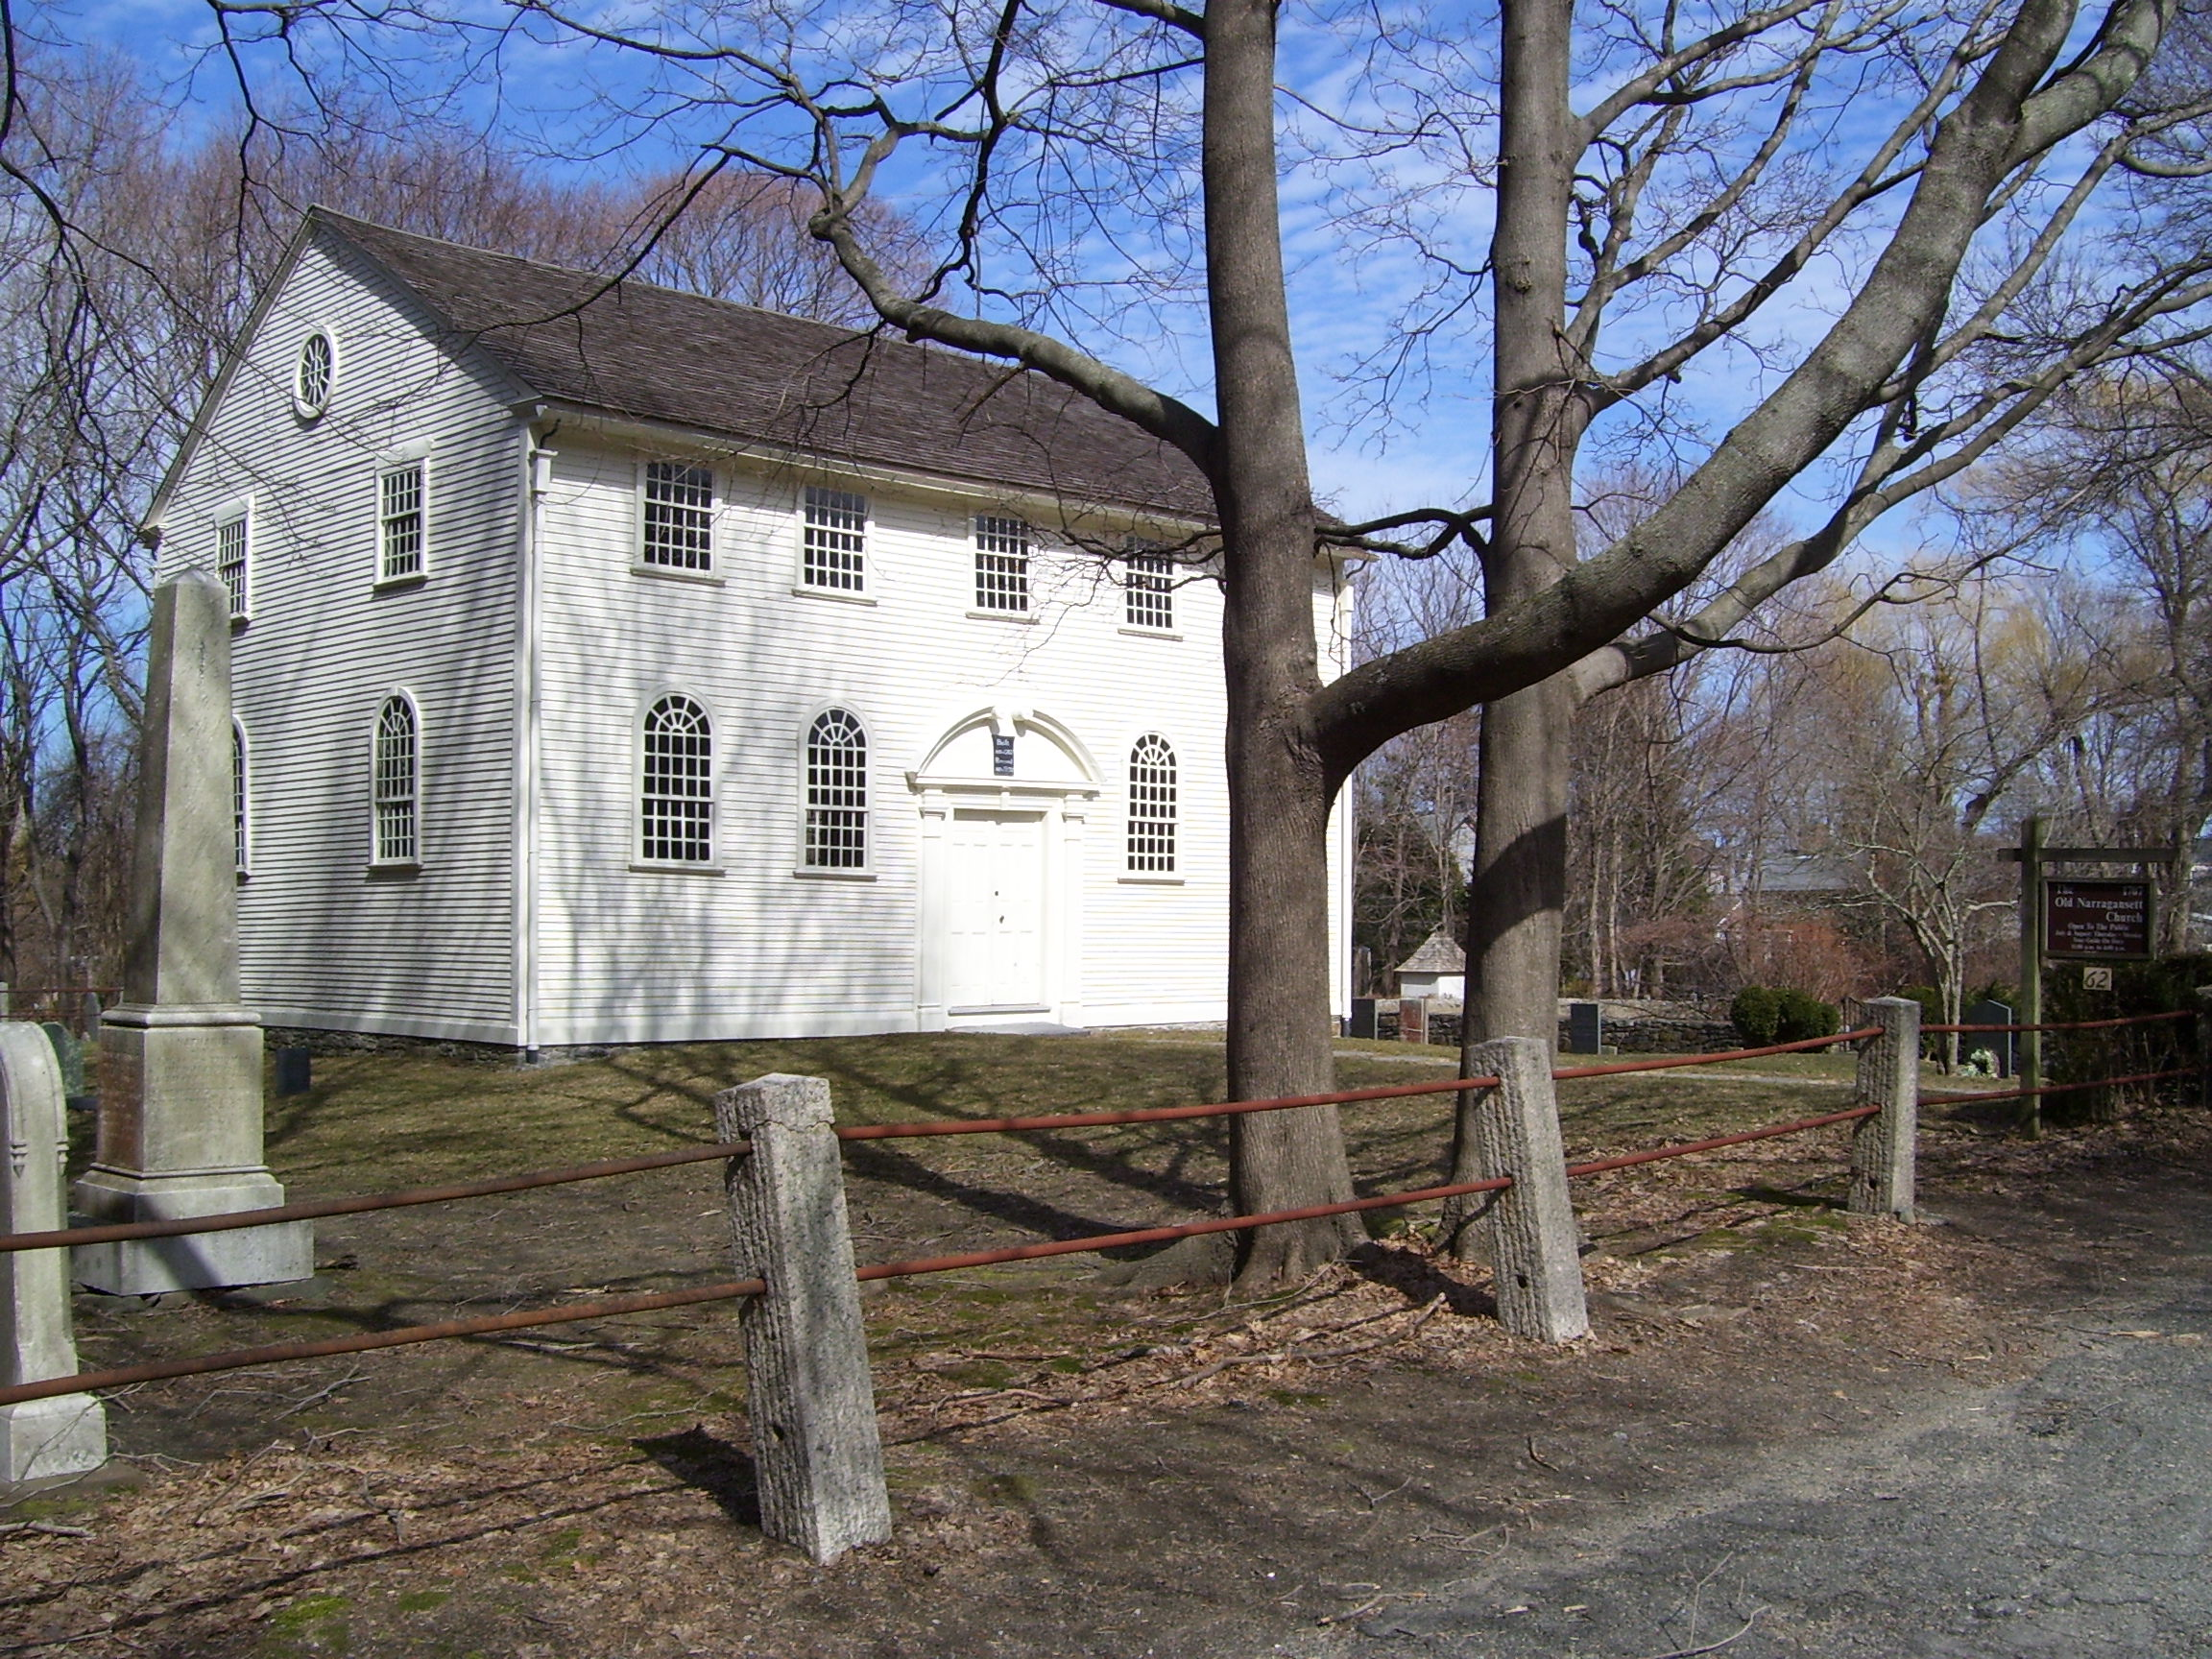 Superior Churches In Rhode Island #1: Old_Narragansett_Church_Episcopal_in_Wickford_Rhode_Island.jpg